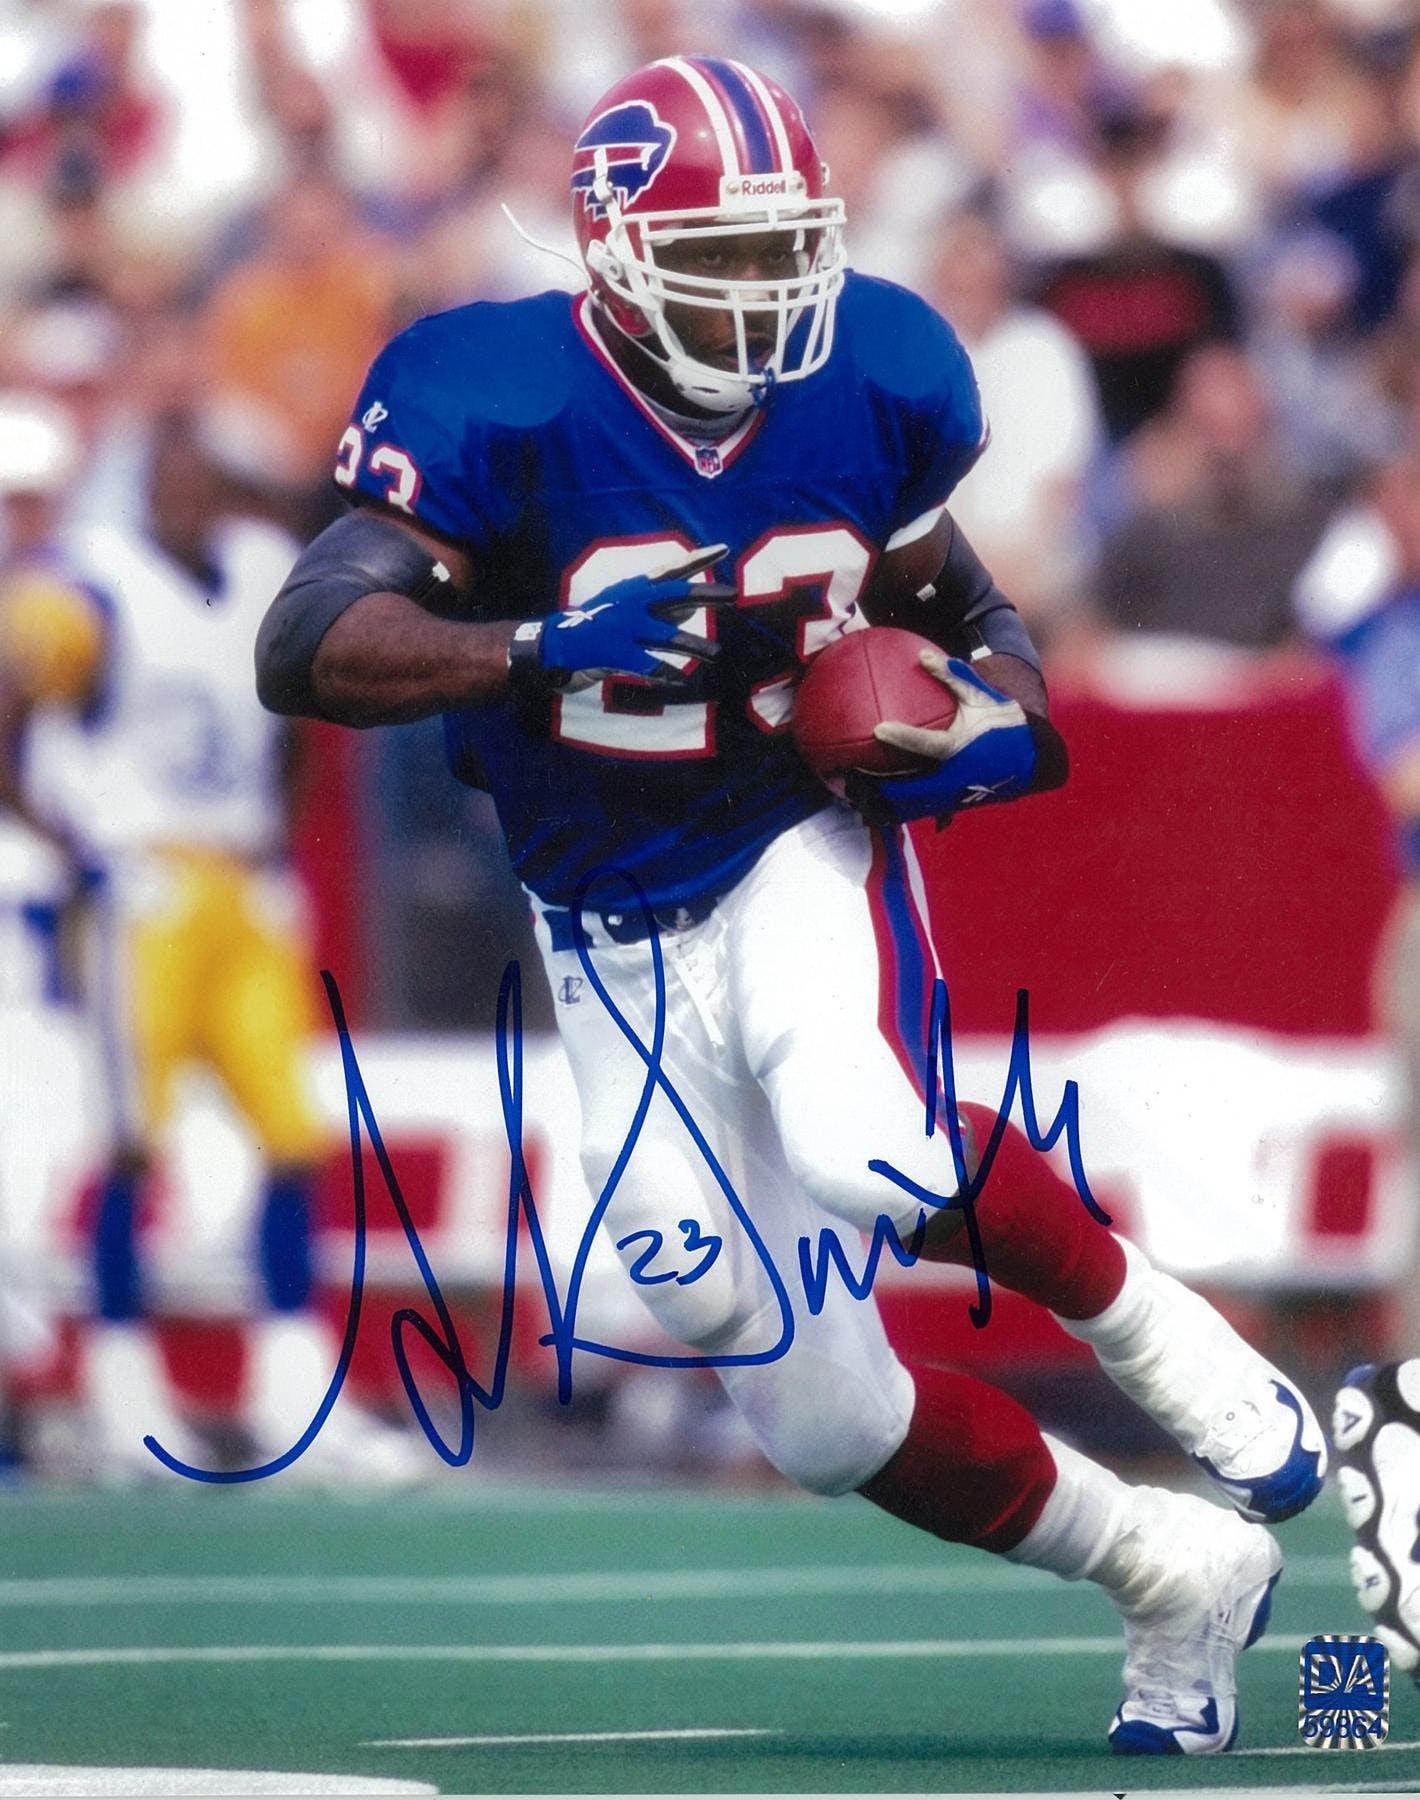 dcfb39f6 Antowain Smith Autographed Buffalo Bills 8x10 Football Photo